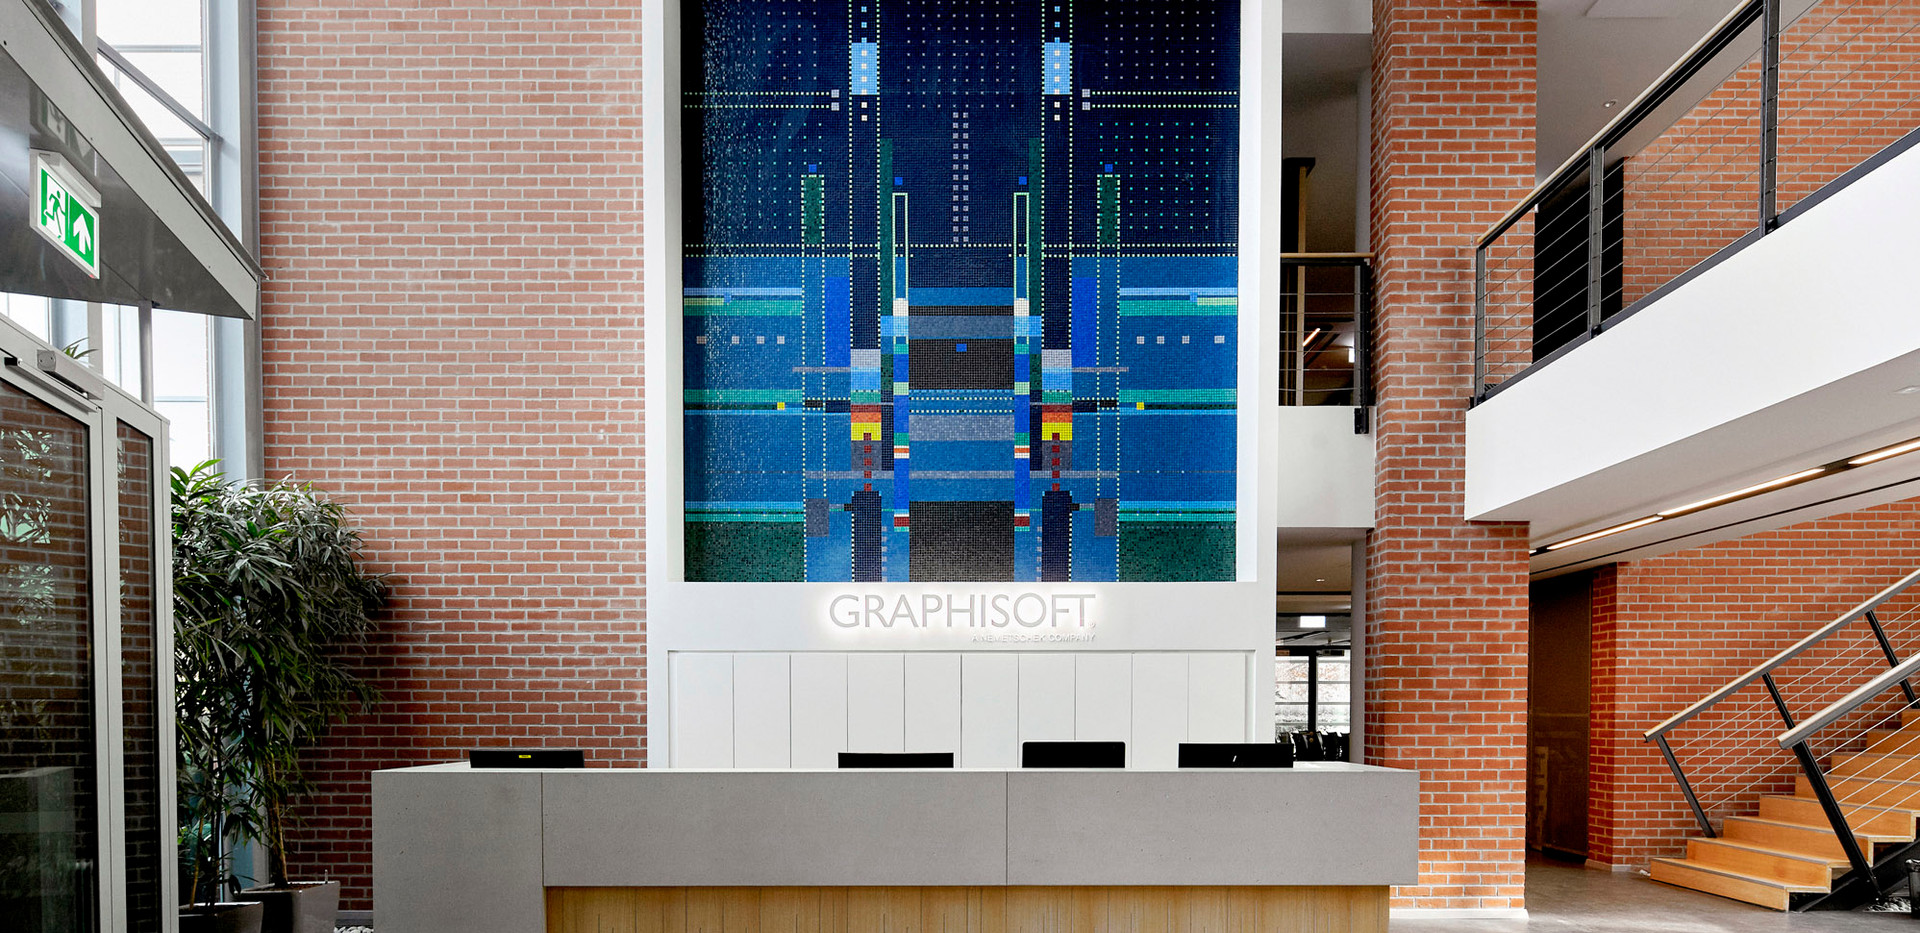 019-Graphisoft-Headquarters-Demeter-Desi